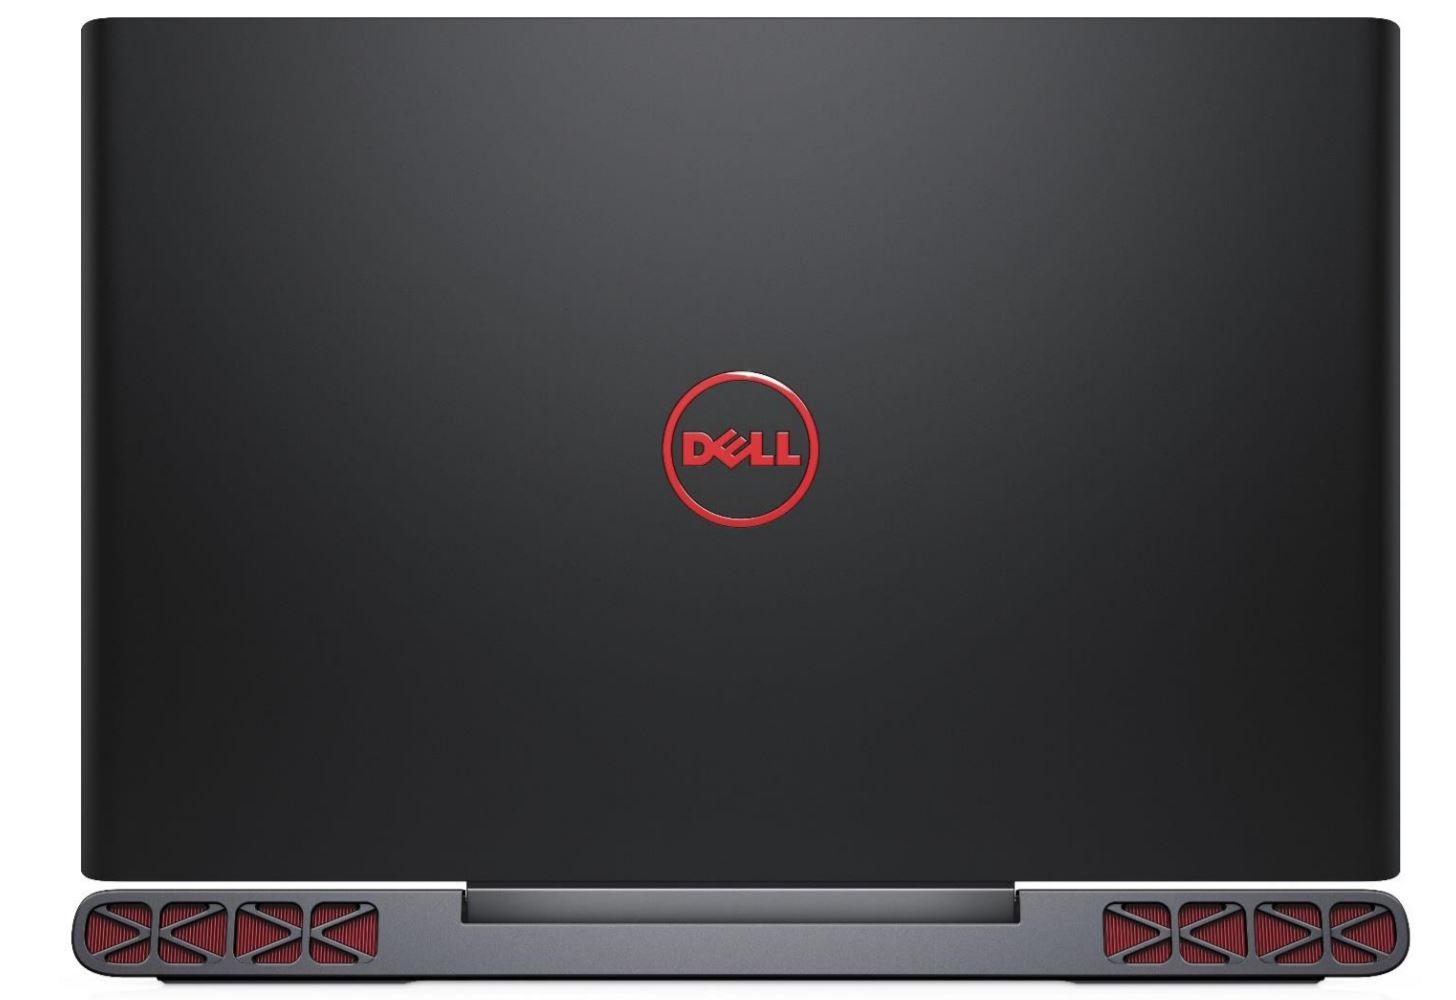 Breve Análise Do Portátil Para Jogos Dell Inspiron 15 7000 7567 Notebookcheck Info